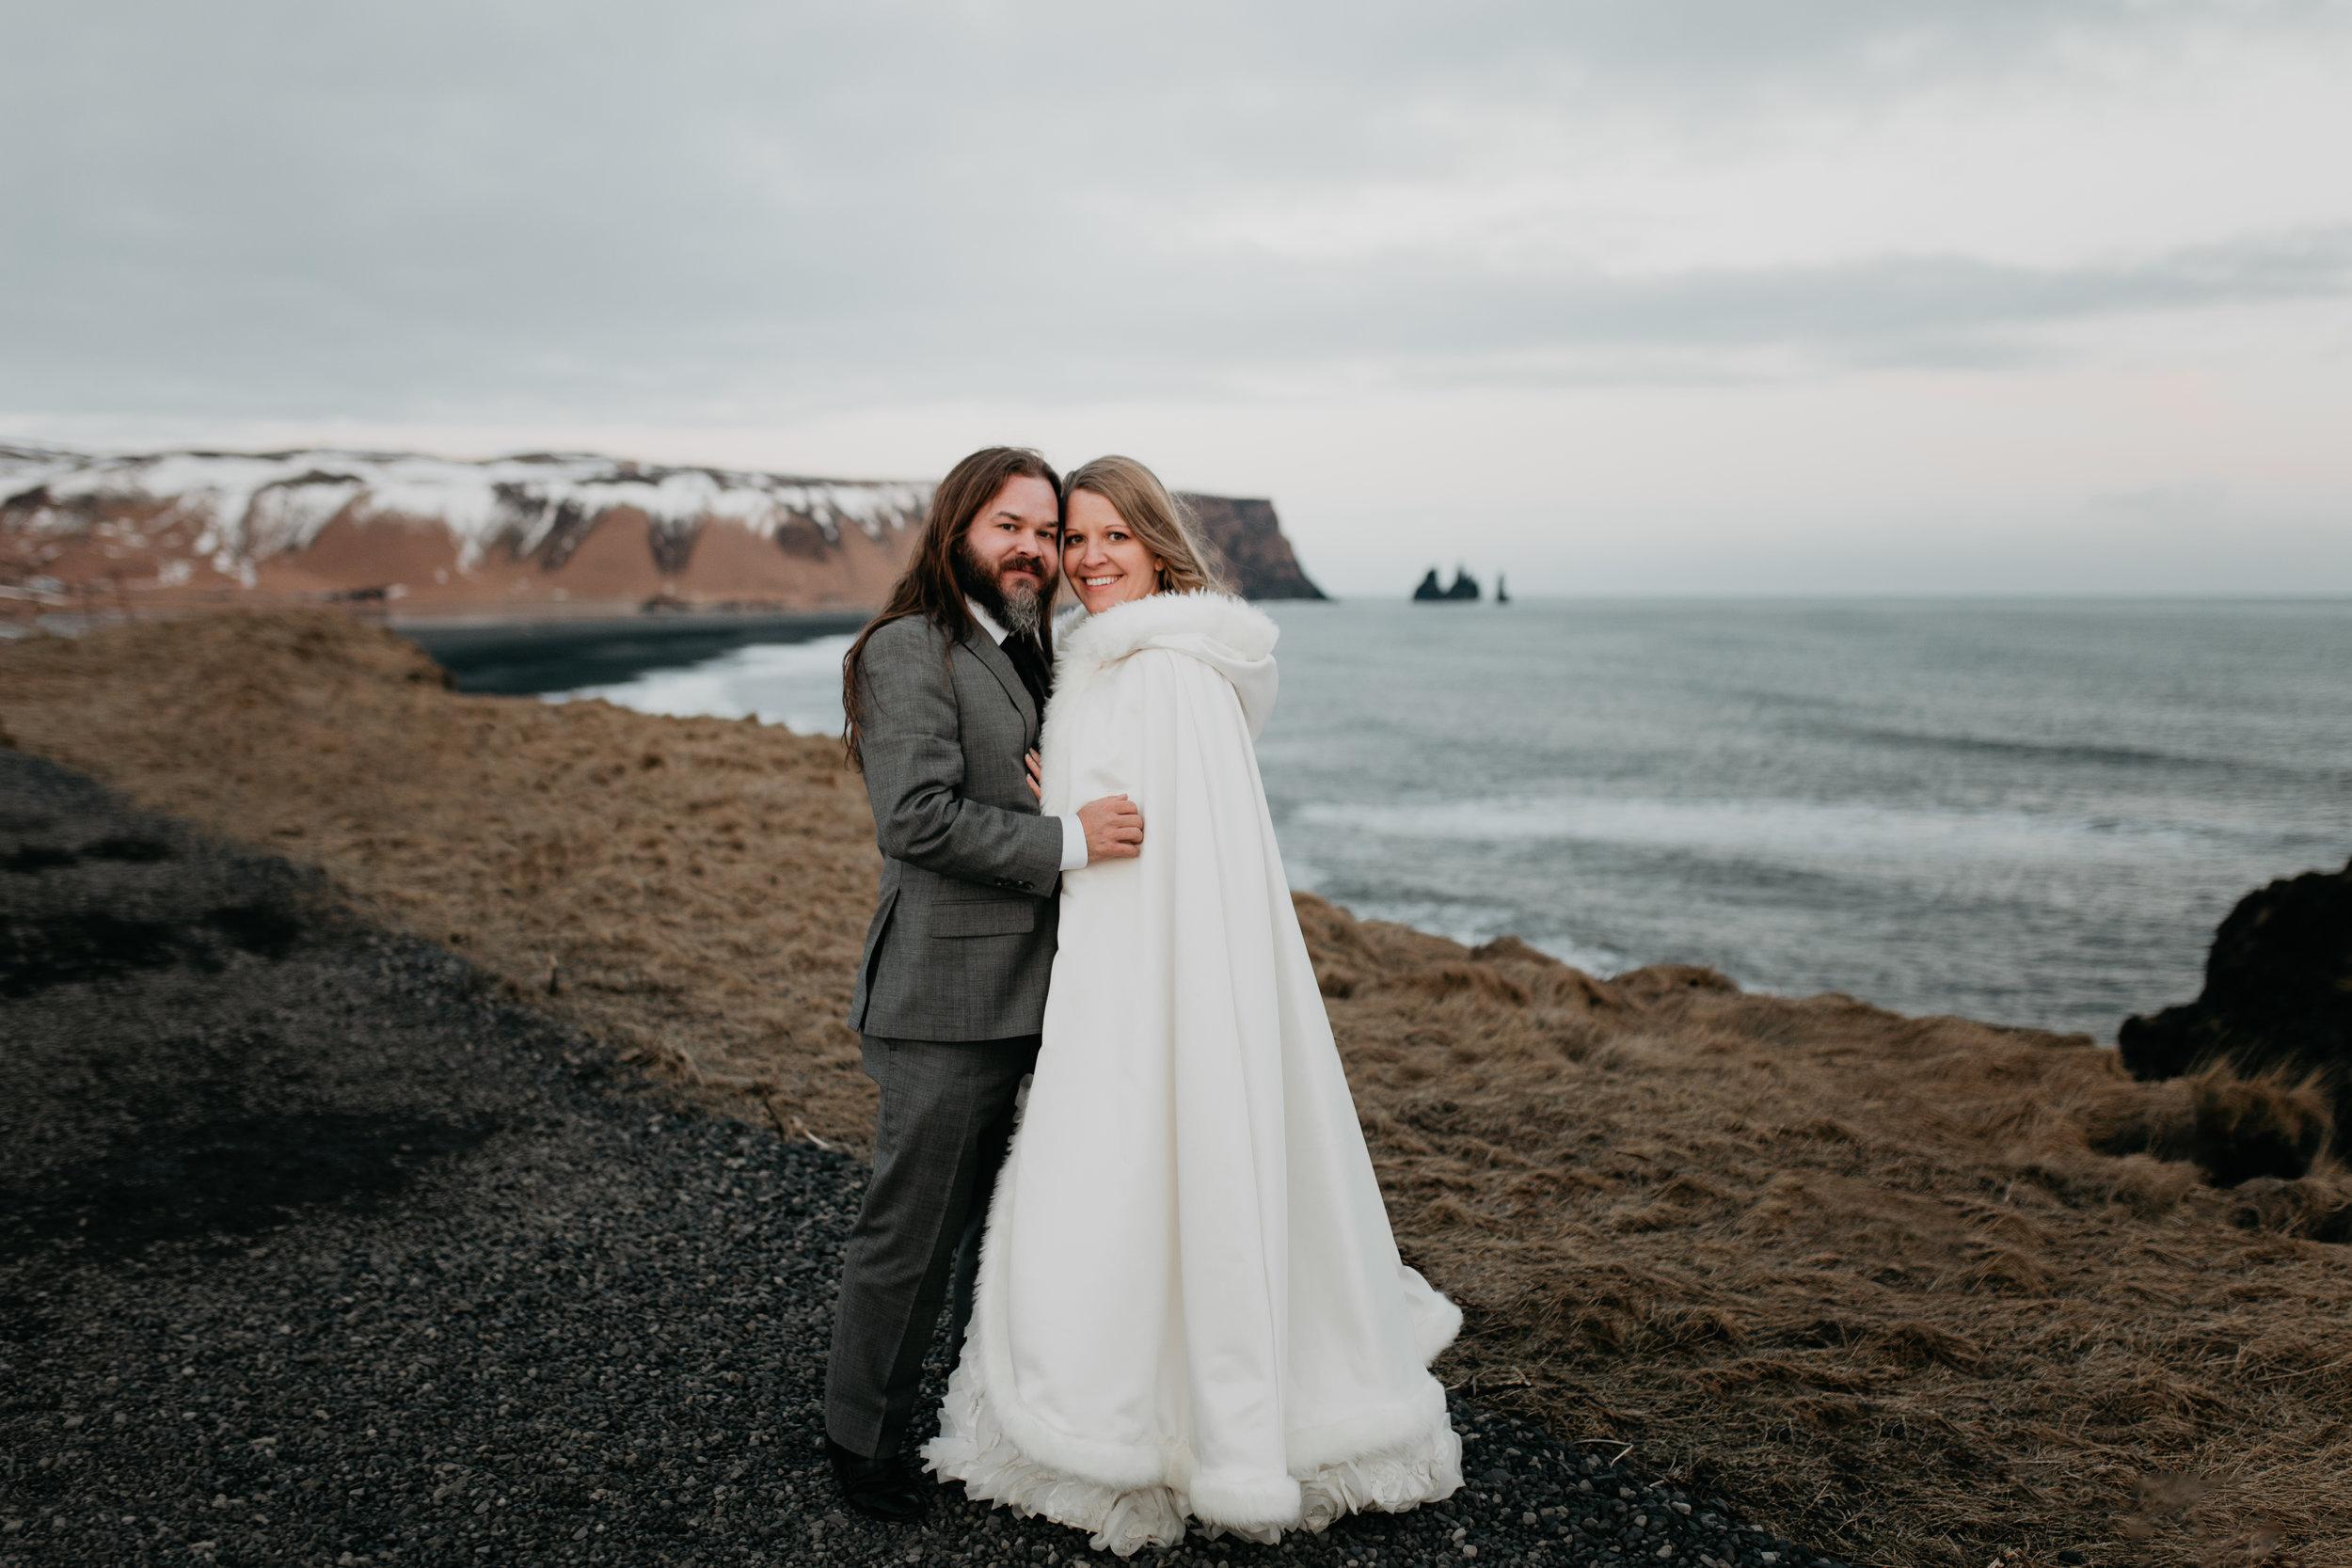 nicole-daacke-photography-iceland-winter-sunset-adventure-elopement-skogafoss-waterfall-black-sand-beach-dyrholaey-vik-iceland-intimate-wedding-black-church-elopement-photographer-51.jpg